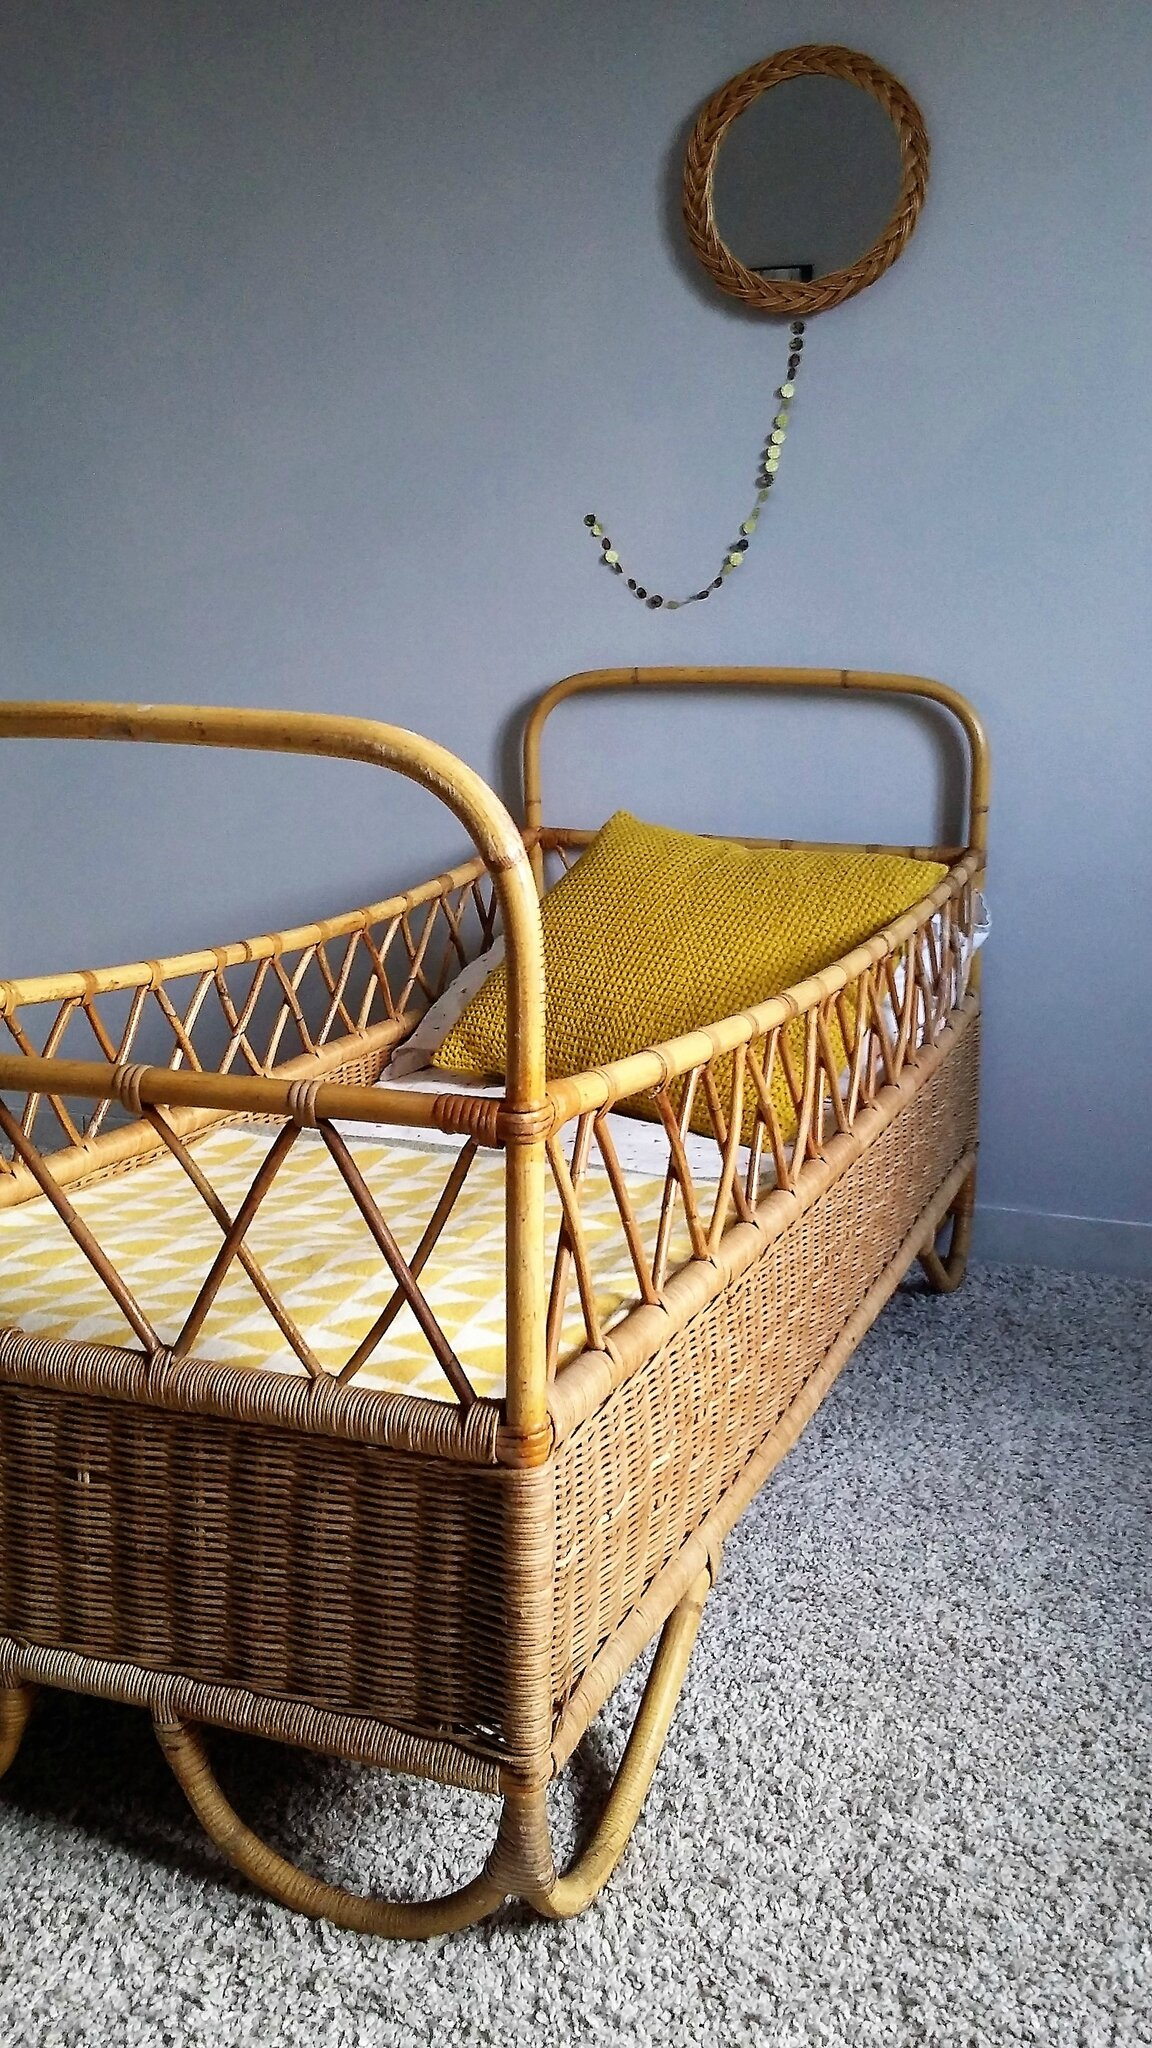 tete de lit osier rotin tte de lit naugatuck with tete de lit osier rotin simple tete de lit. Black Bedroom Furniture Sets. Home Design Ideas